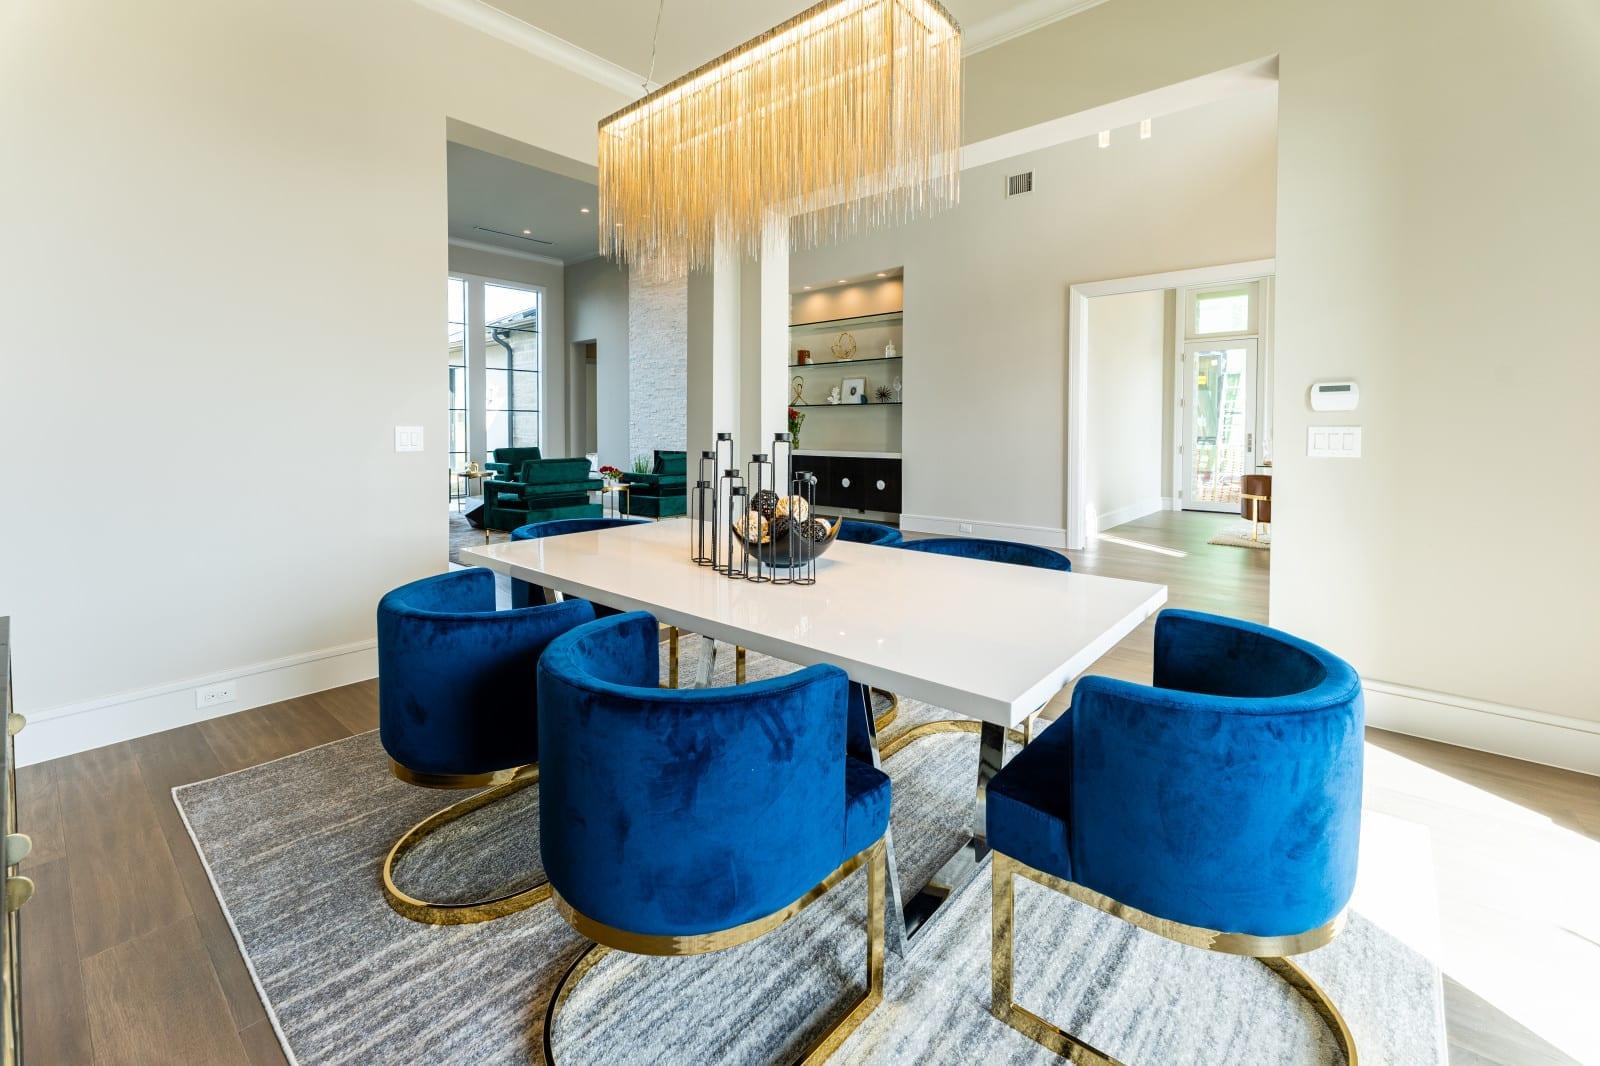 Modern Style Homes design # 7 - Millennial Design + Build